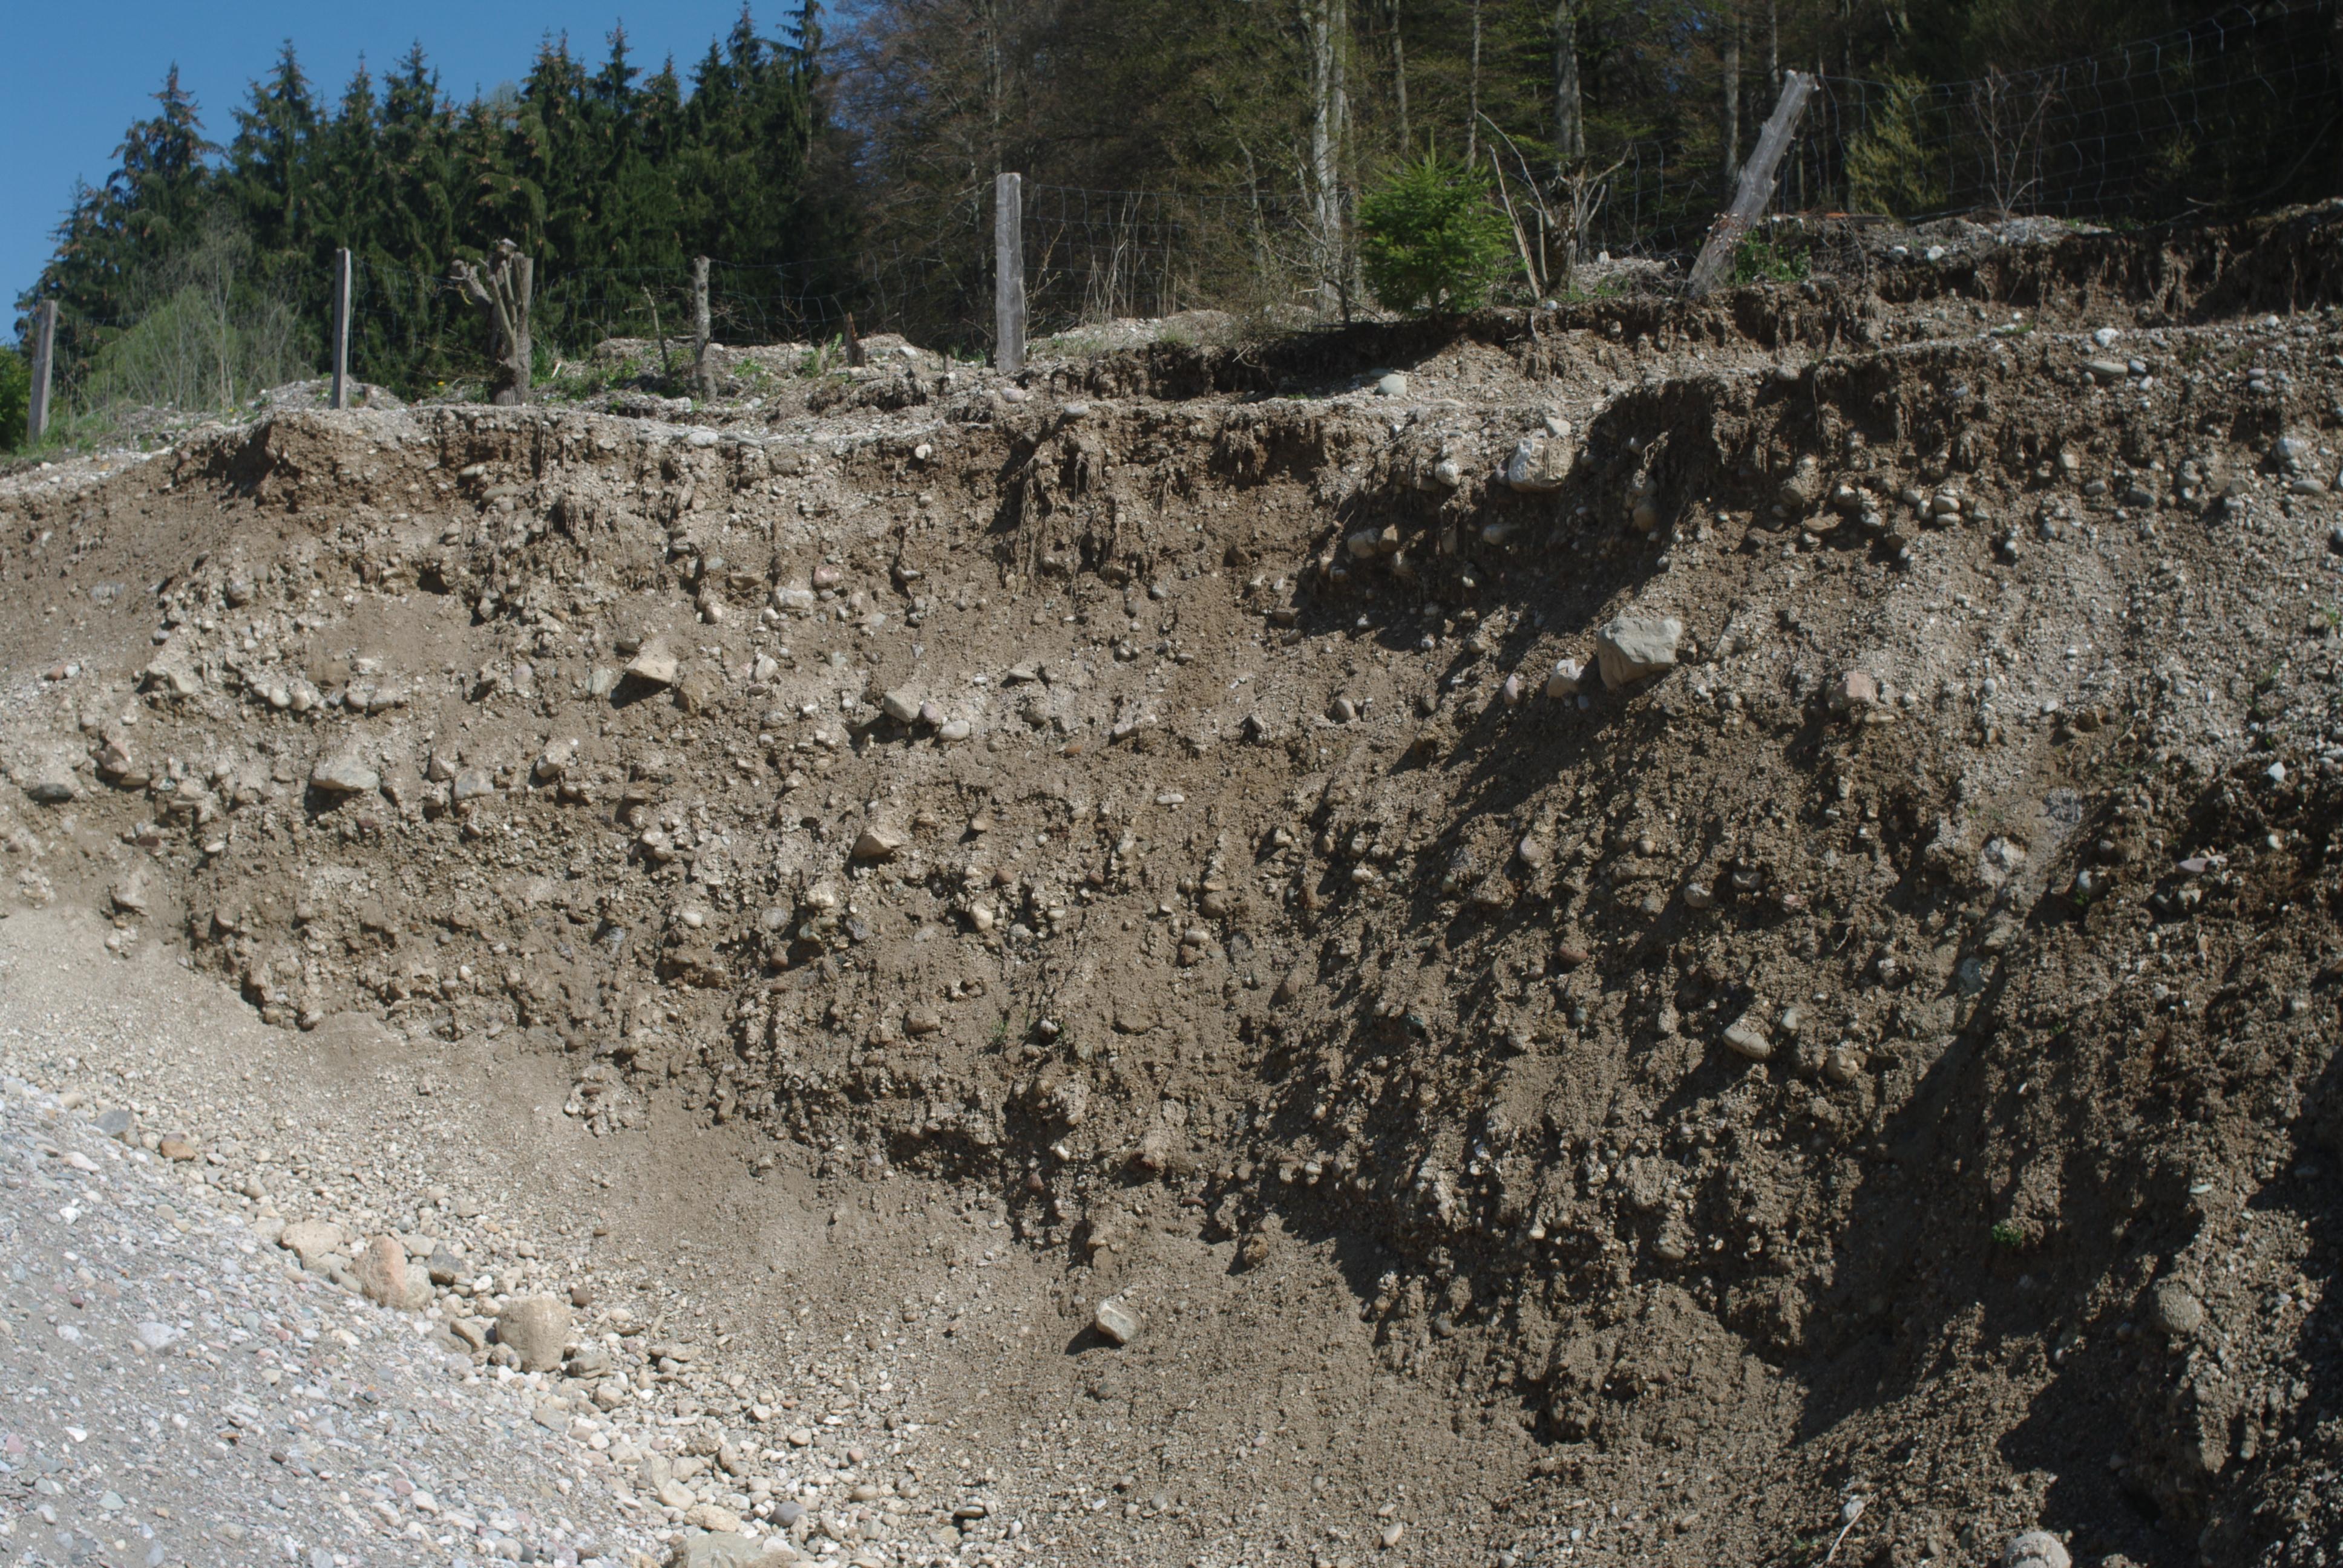 Tsunami Diamiktit Chiemsee Chiemgau-Impakt